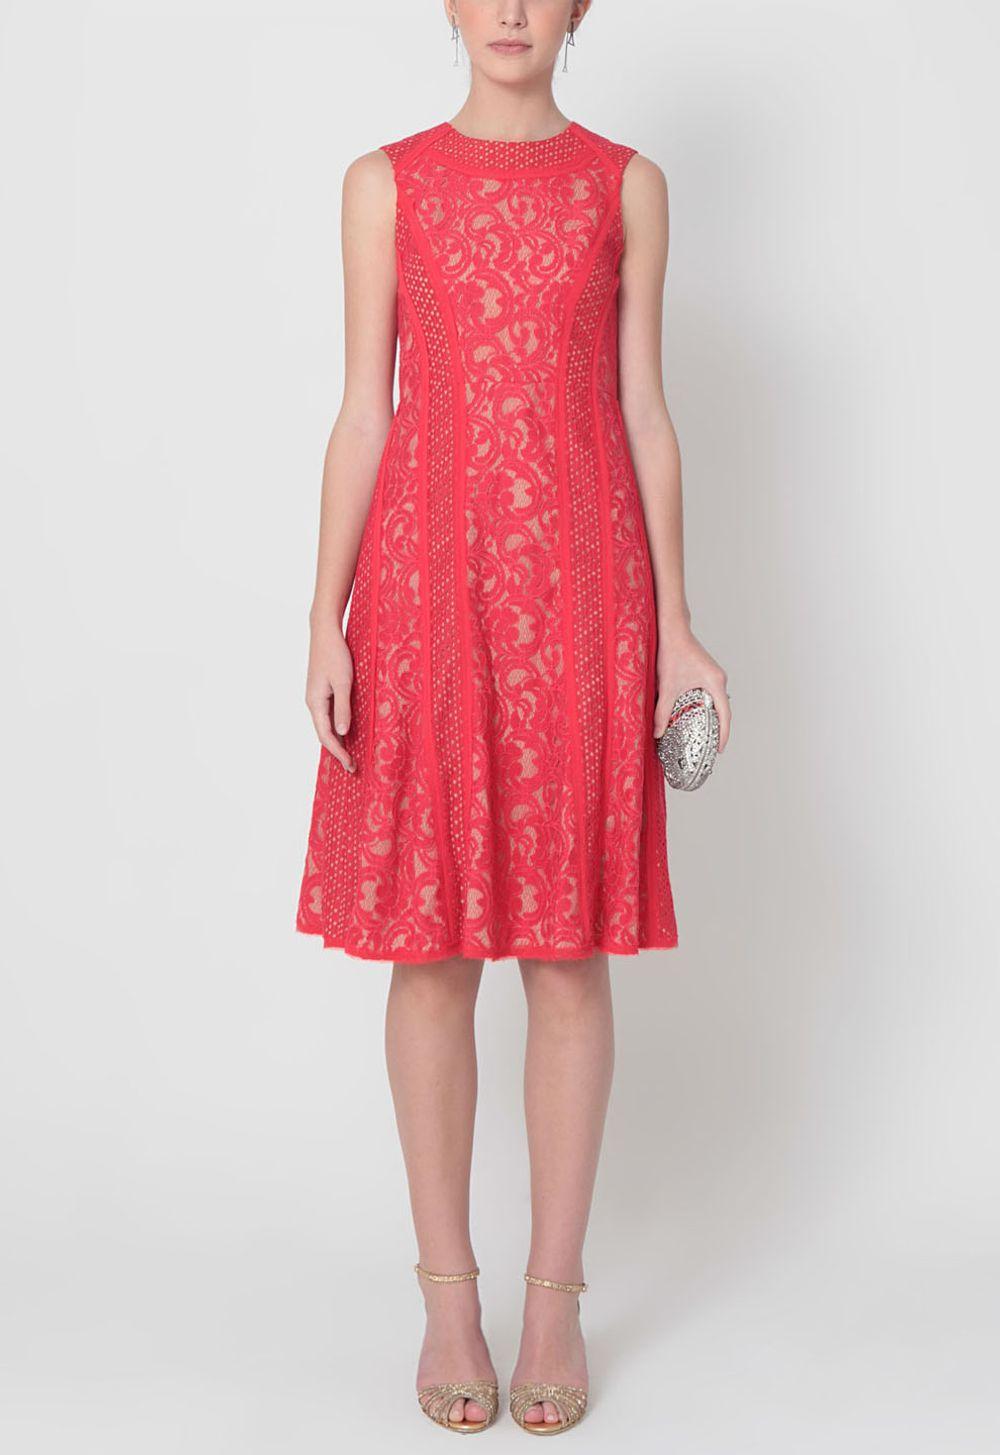 71f7ea118 vestido-dudalina-midi-rendado-bcbg-maxazria-vermelho ...